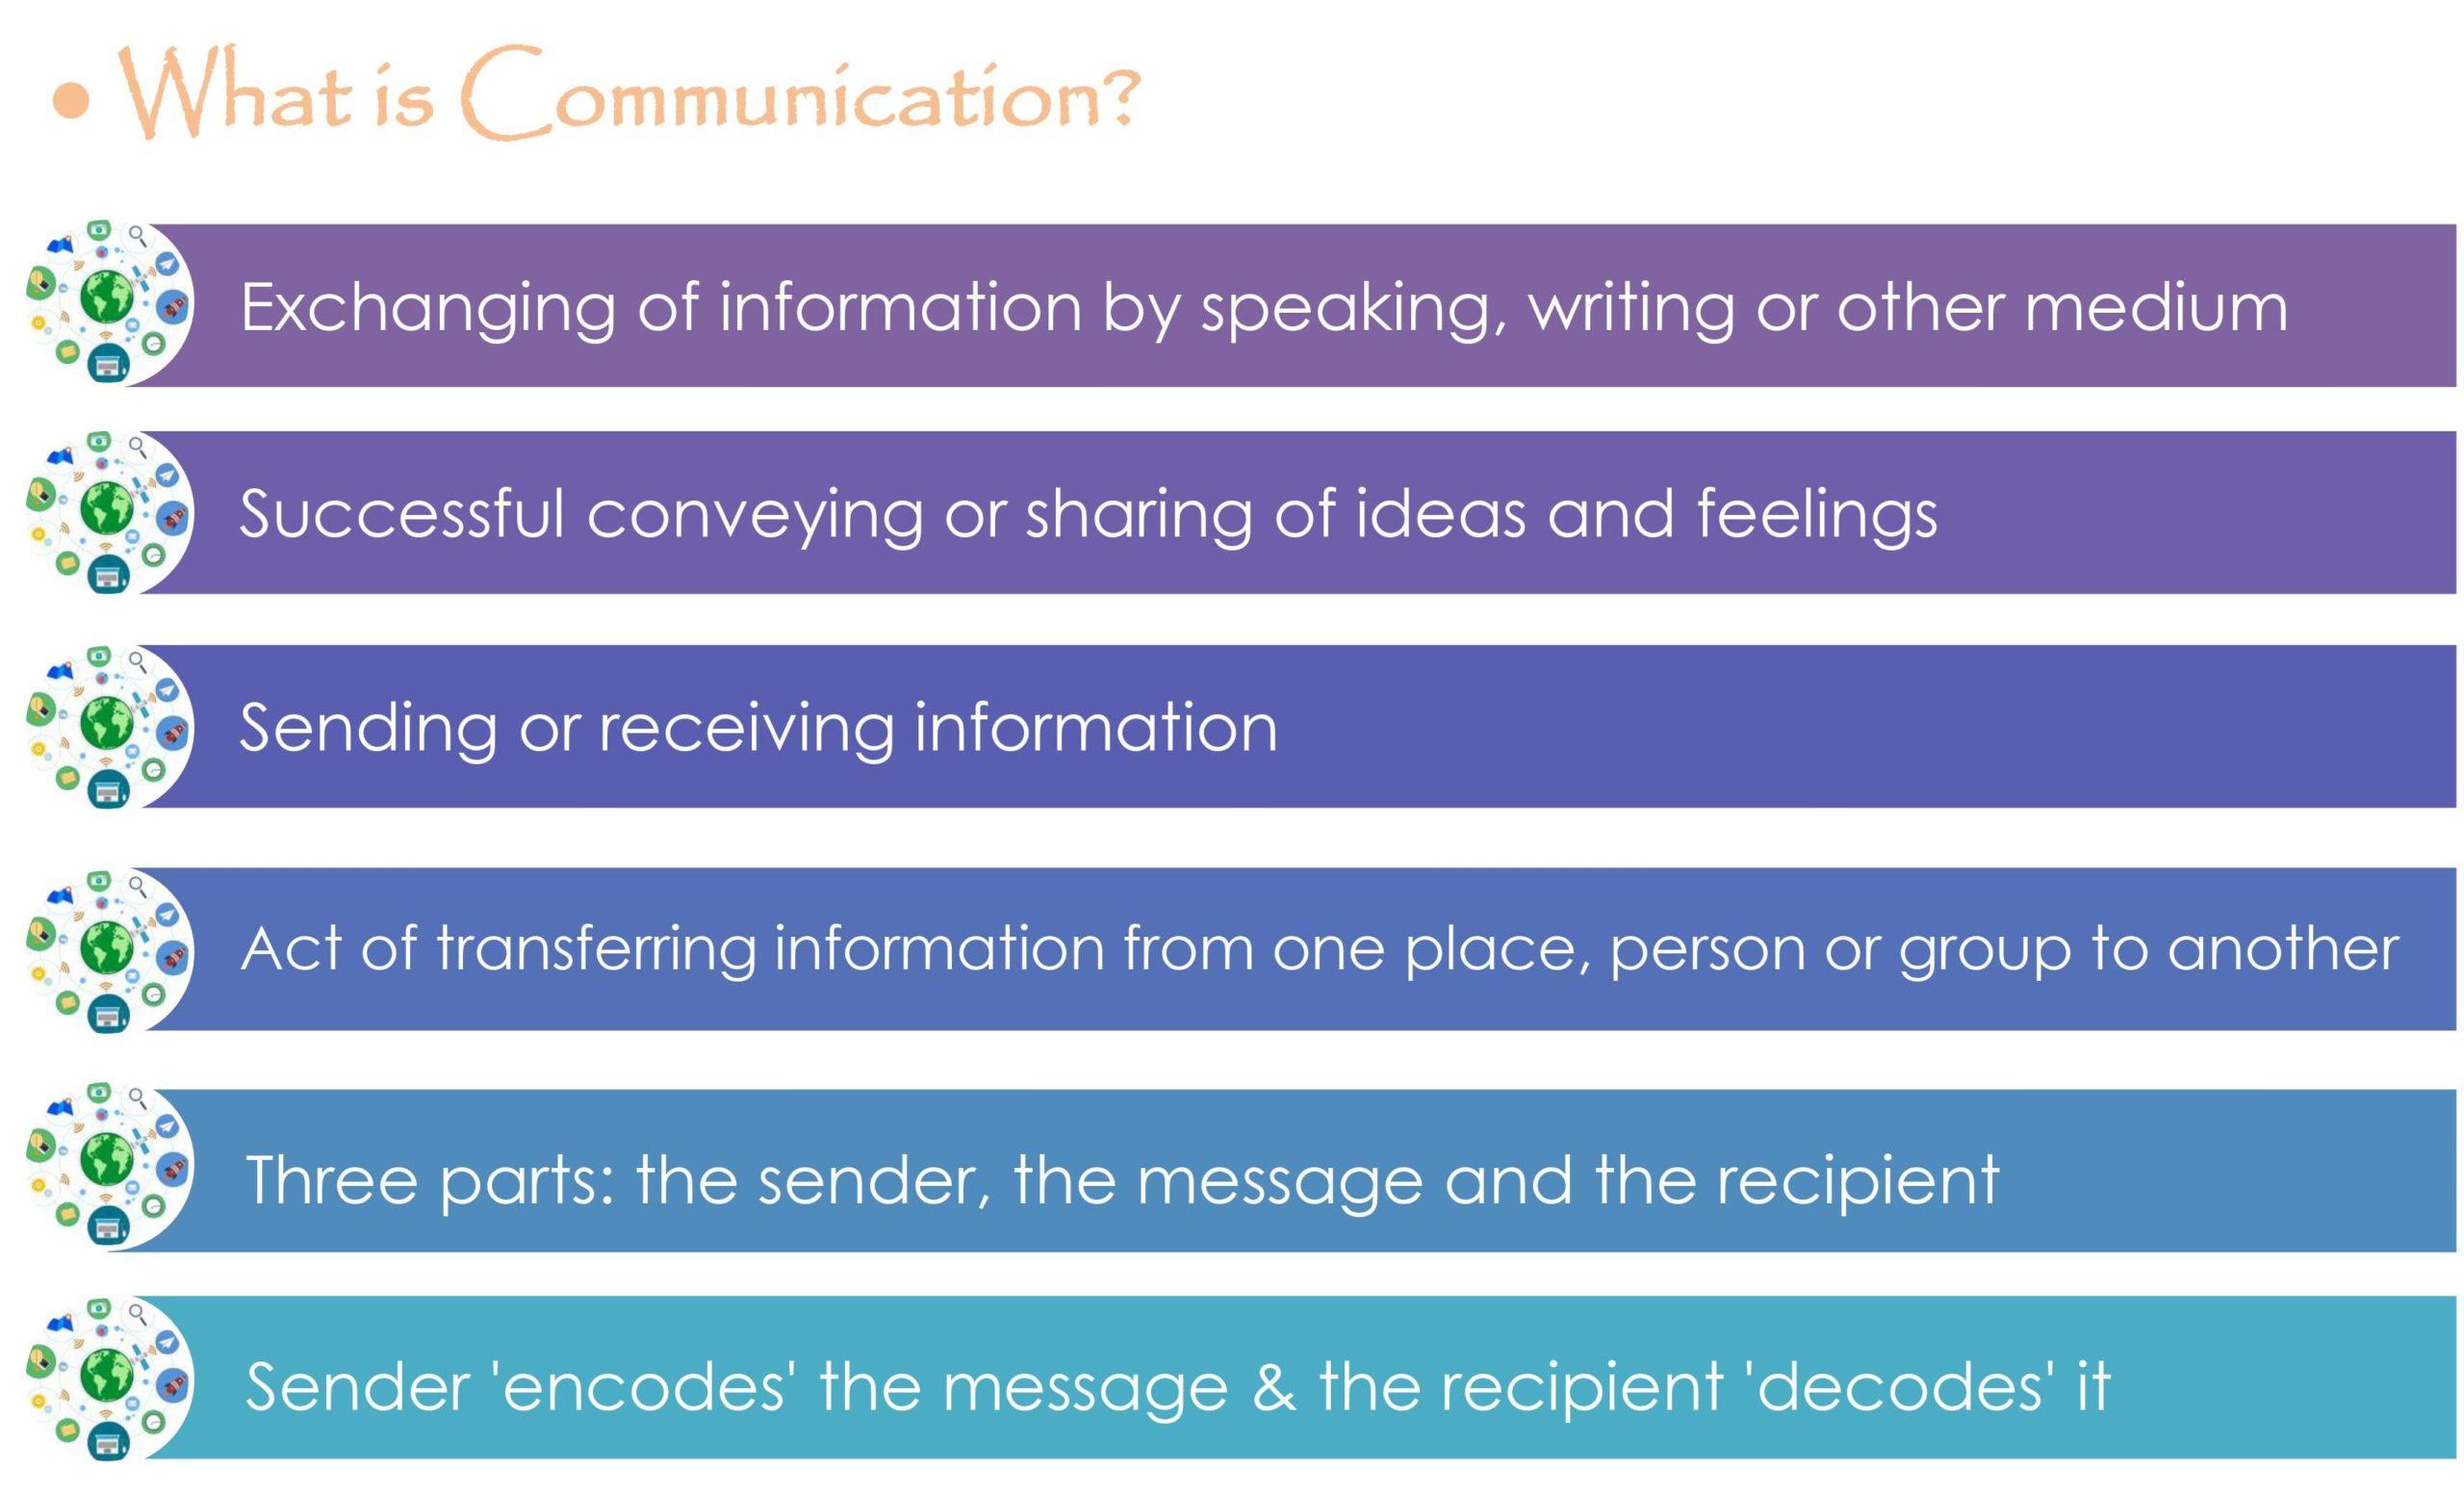 drafting_virtual_message_01